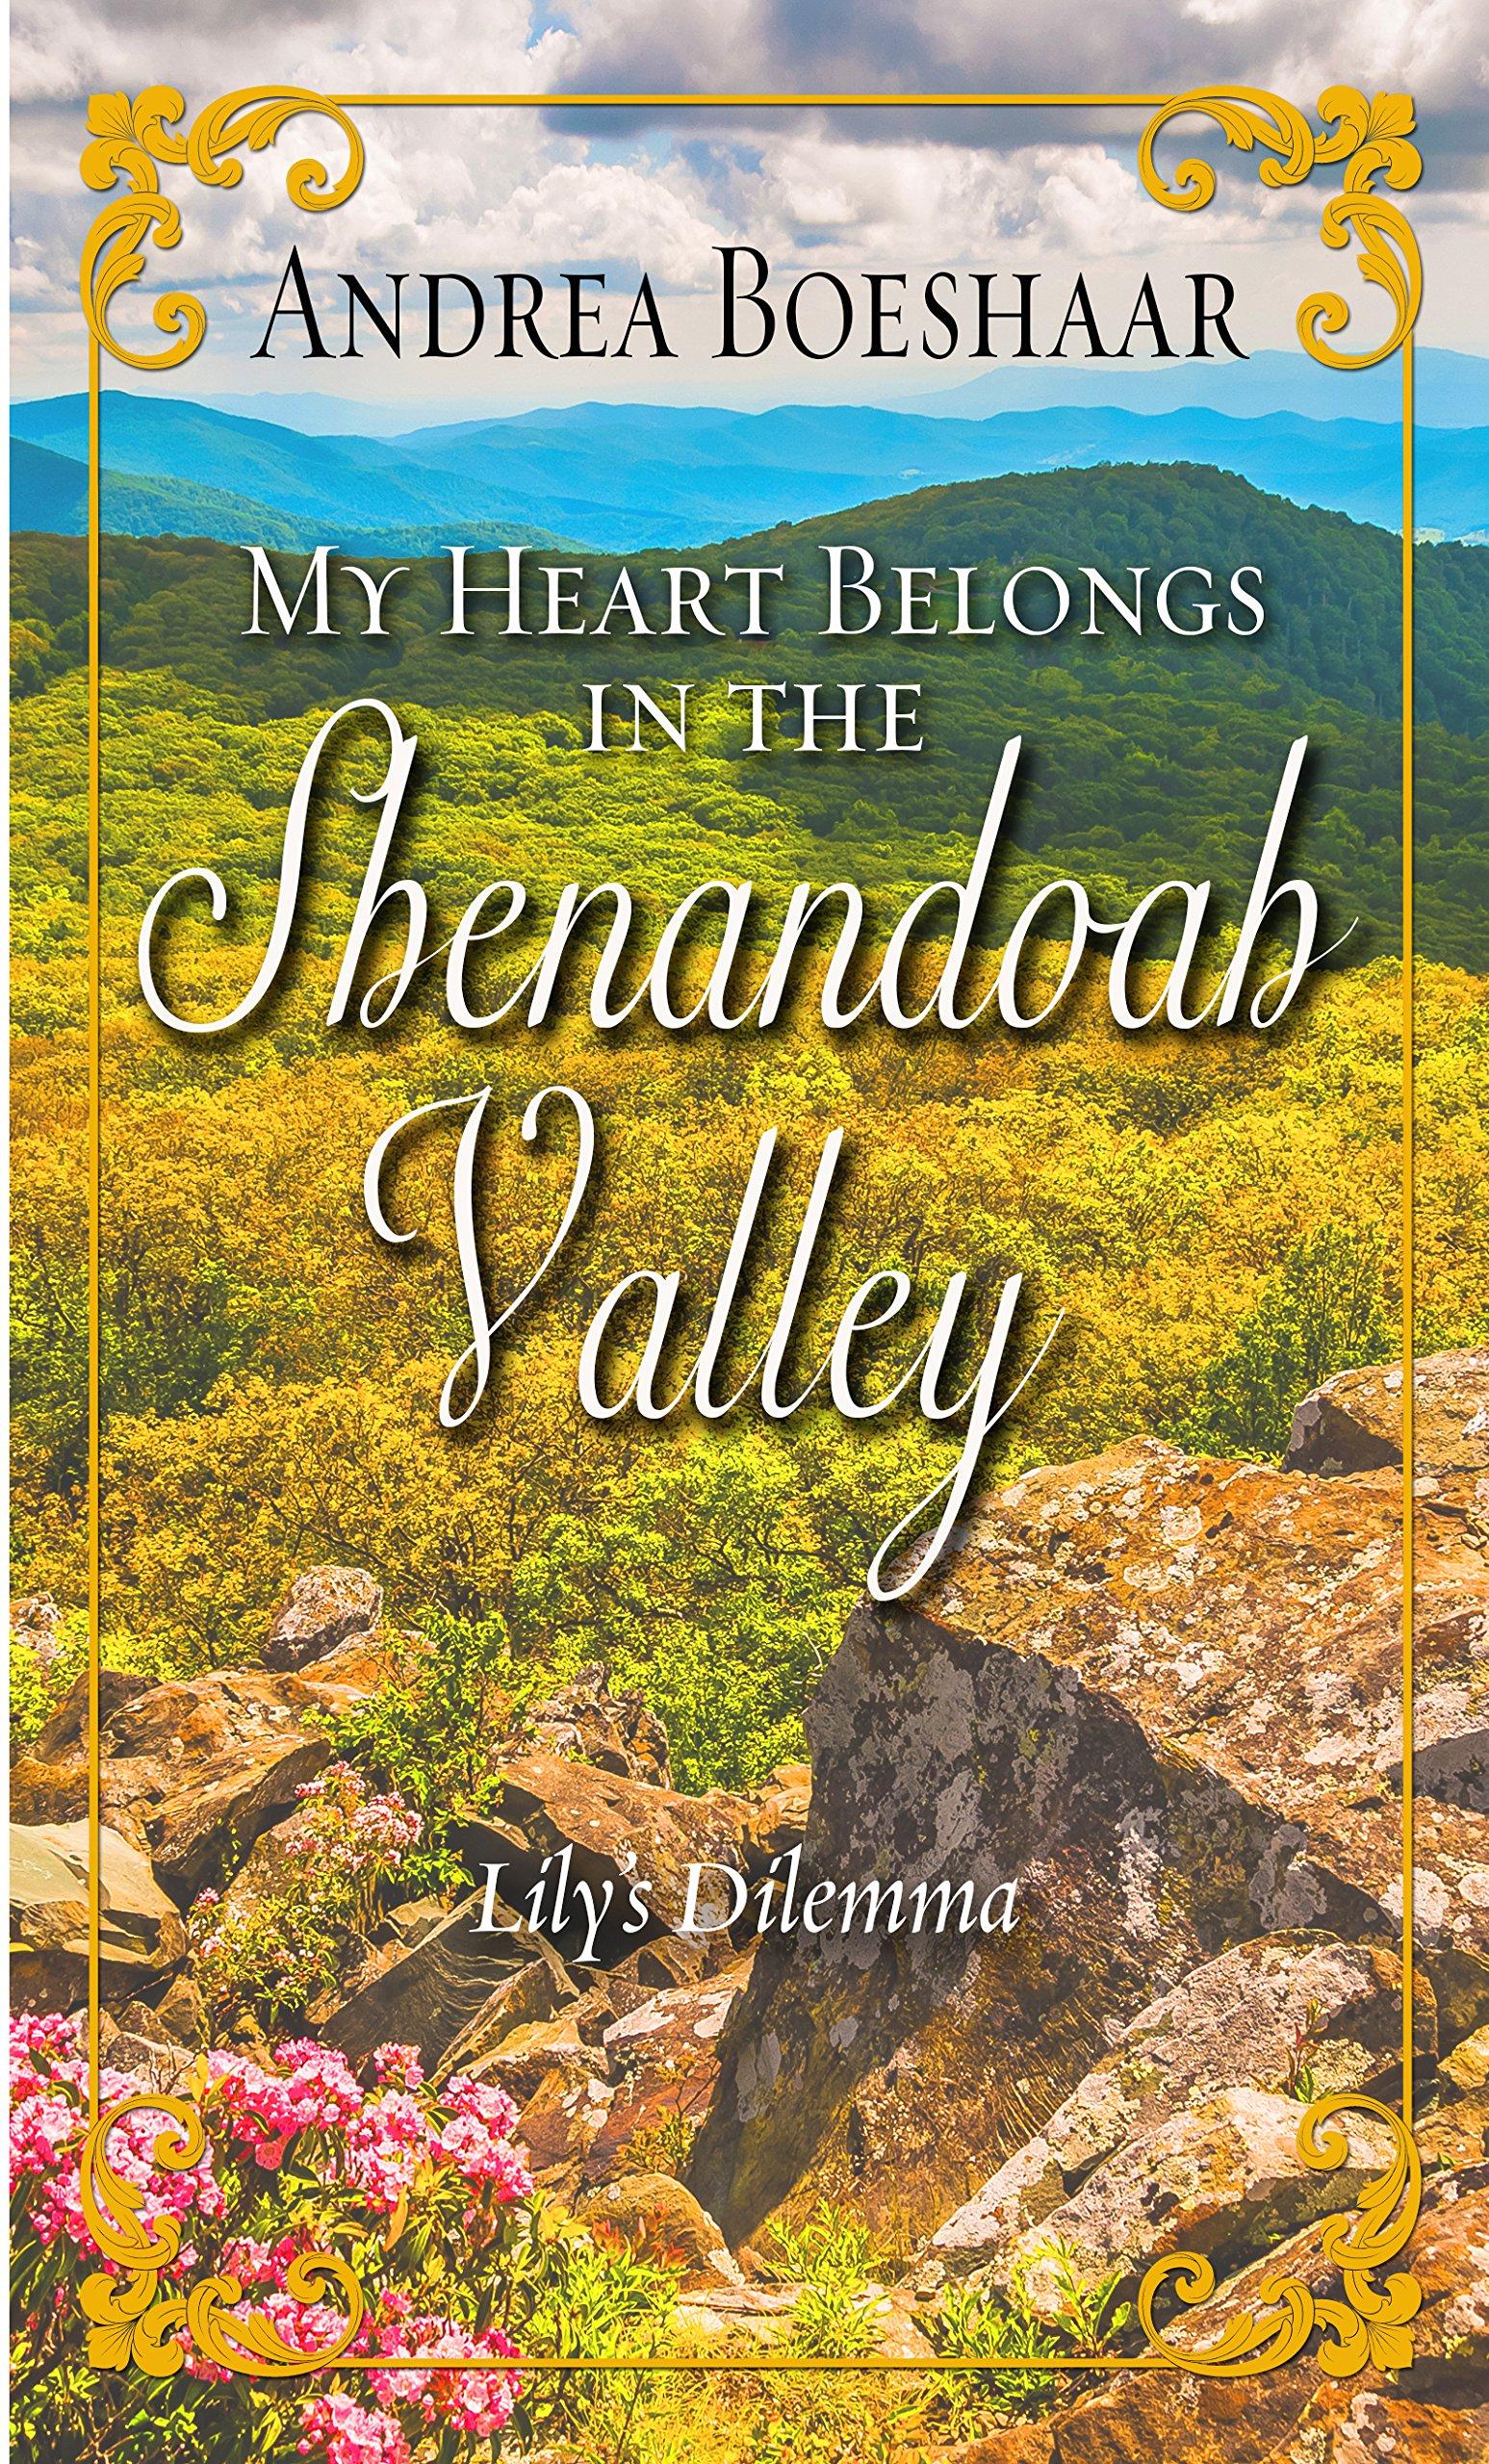 Download My Heart Belongs in the Shenandoah Valley: Lily's Dilemma (Thorndike Press Large Print Christian Romance) PDF